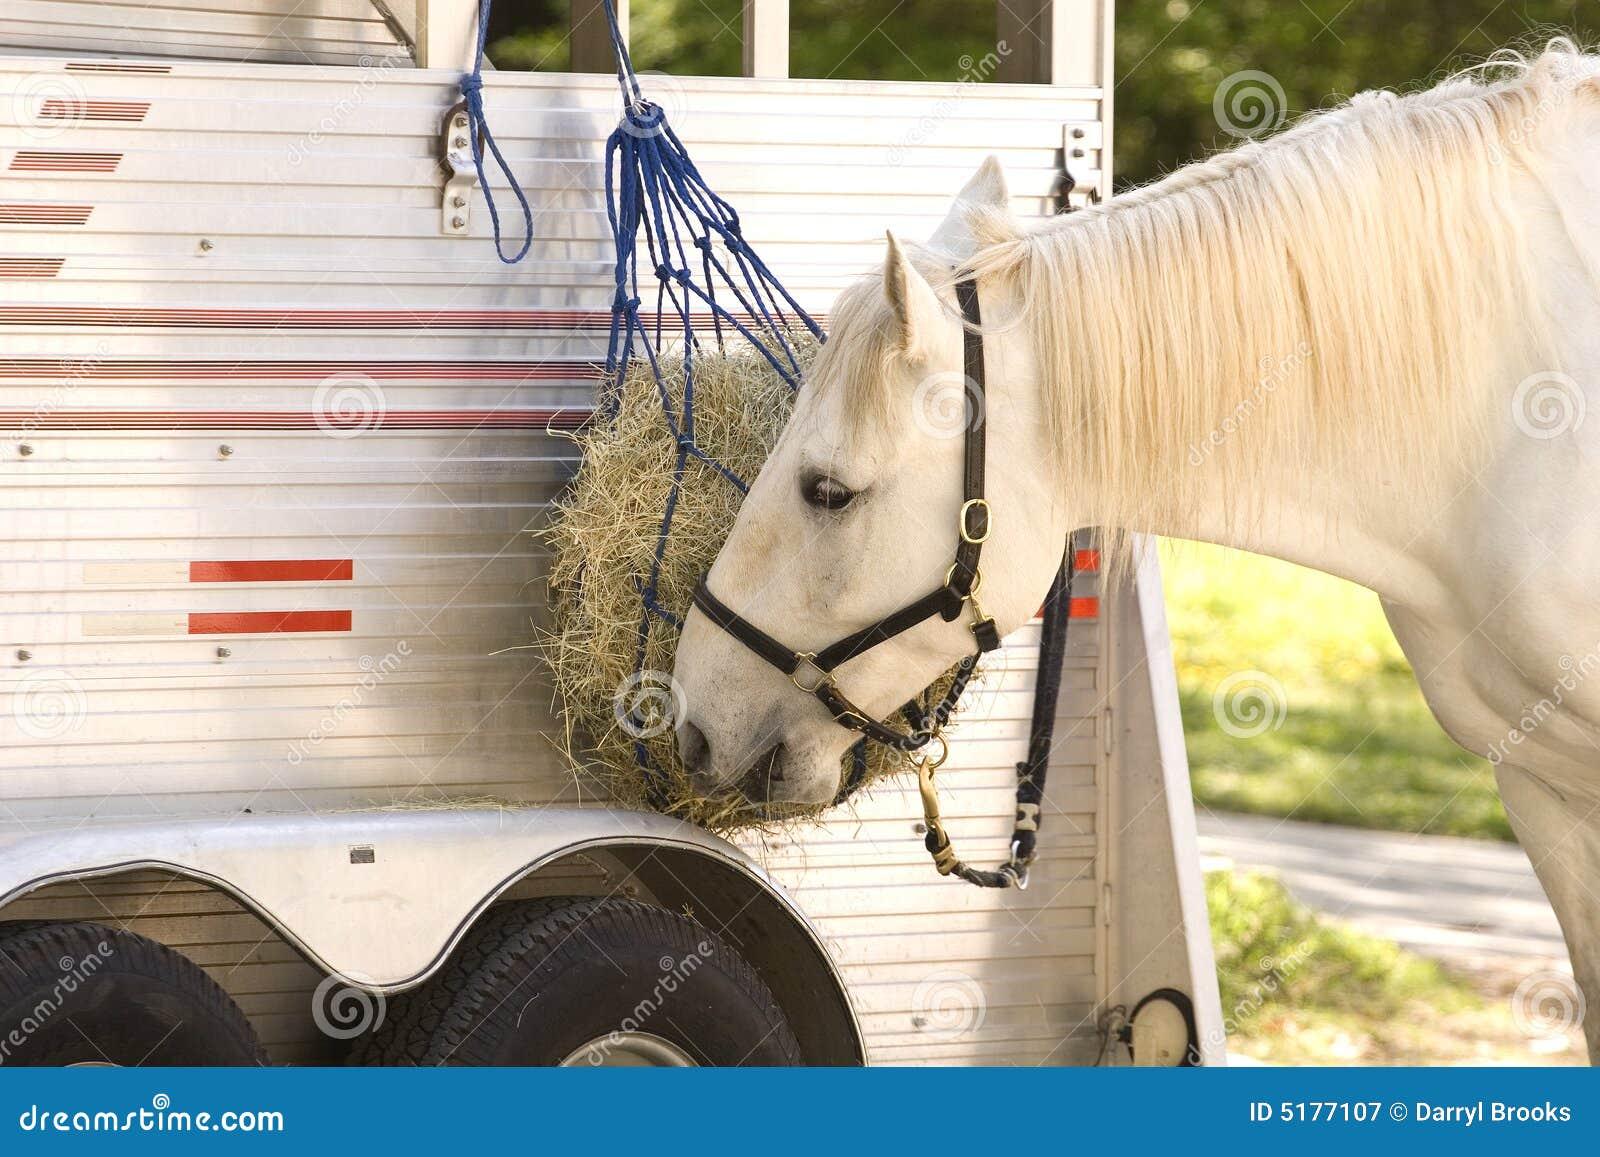 white horse eating royalty free stock photography image